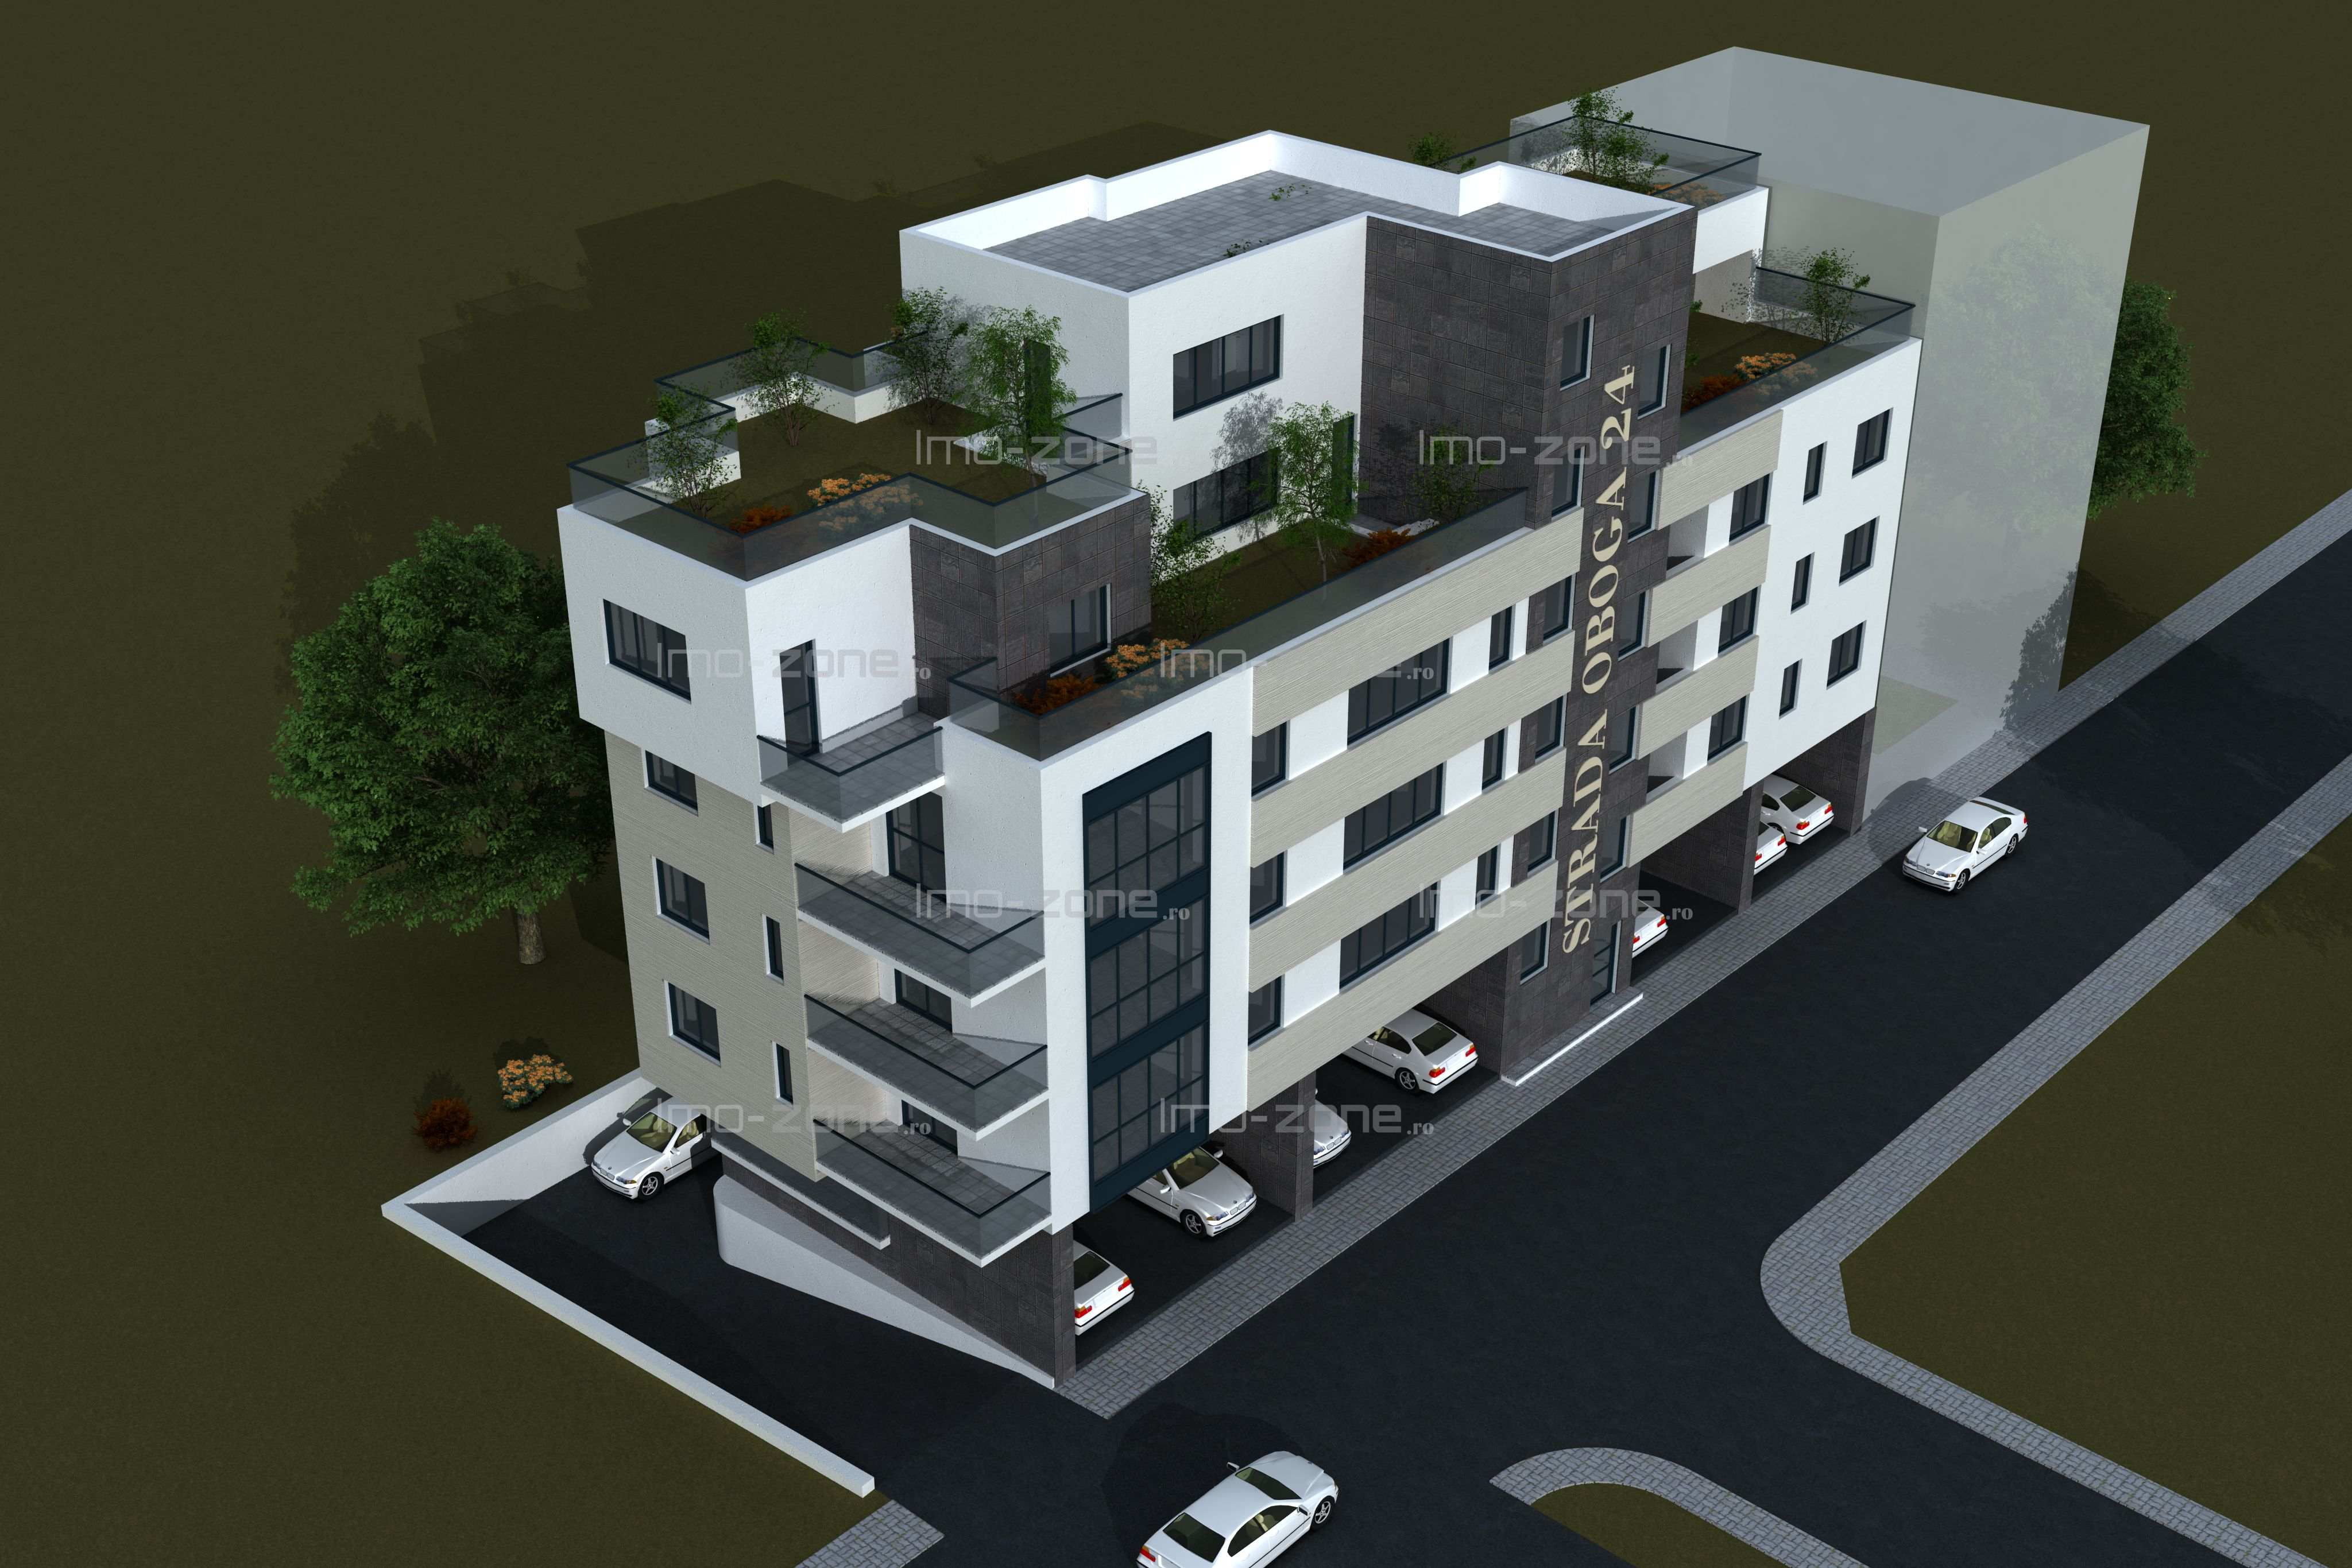 COMISION 0%, apartament 2 camere MILITARI, decomandat, 73 mp.S.U, finisat modern